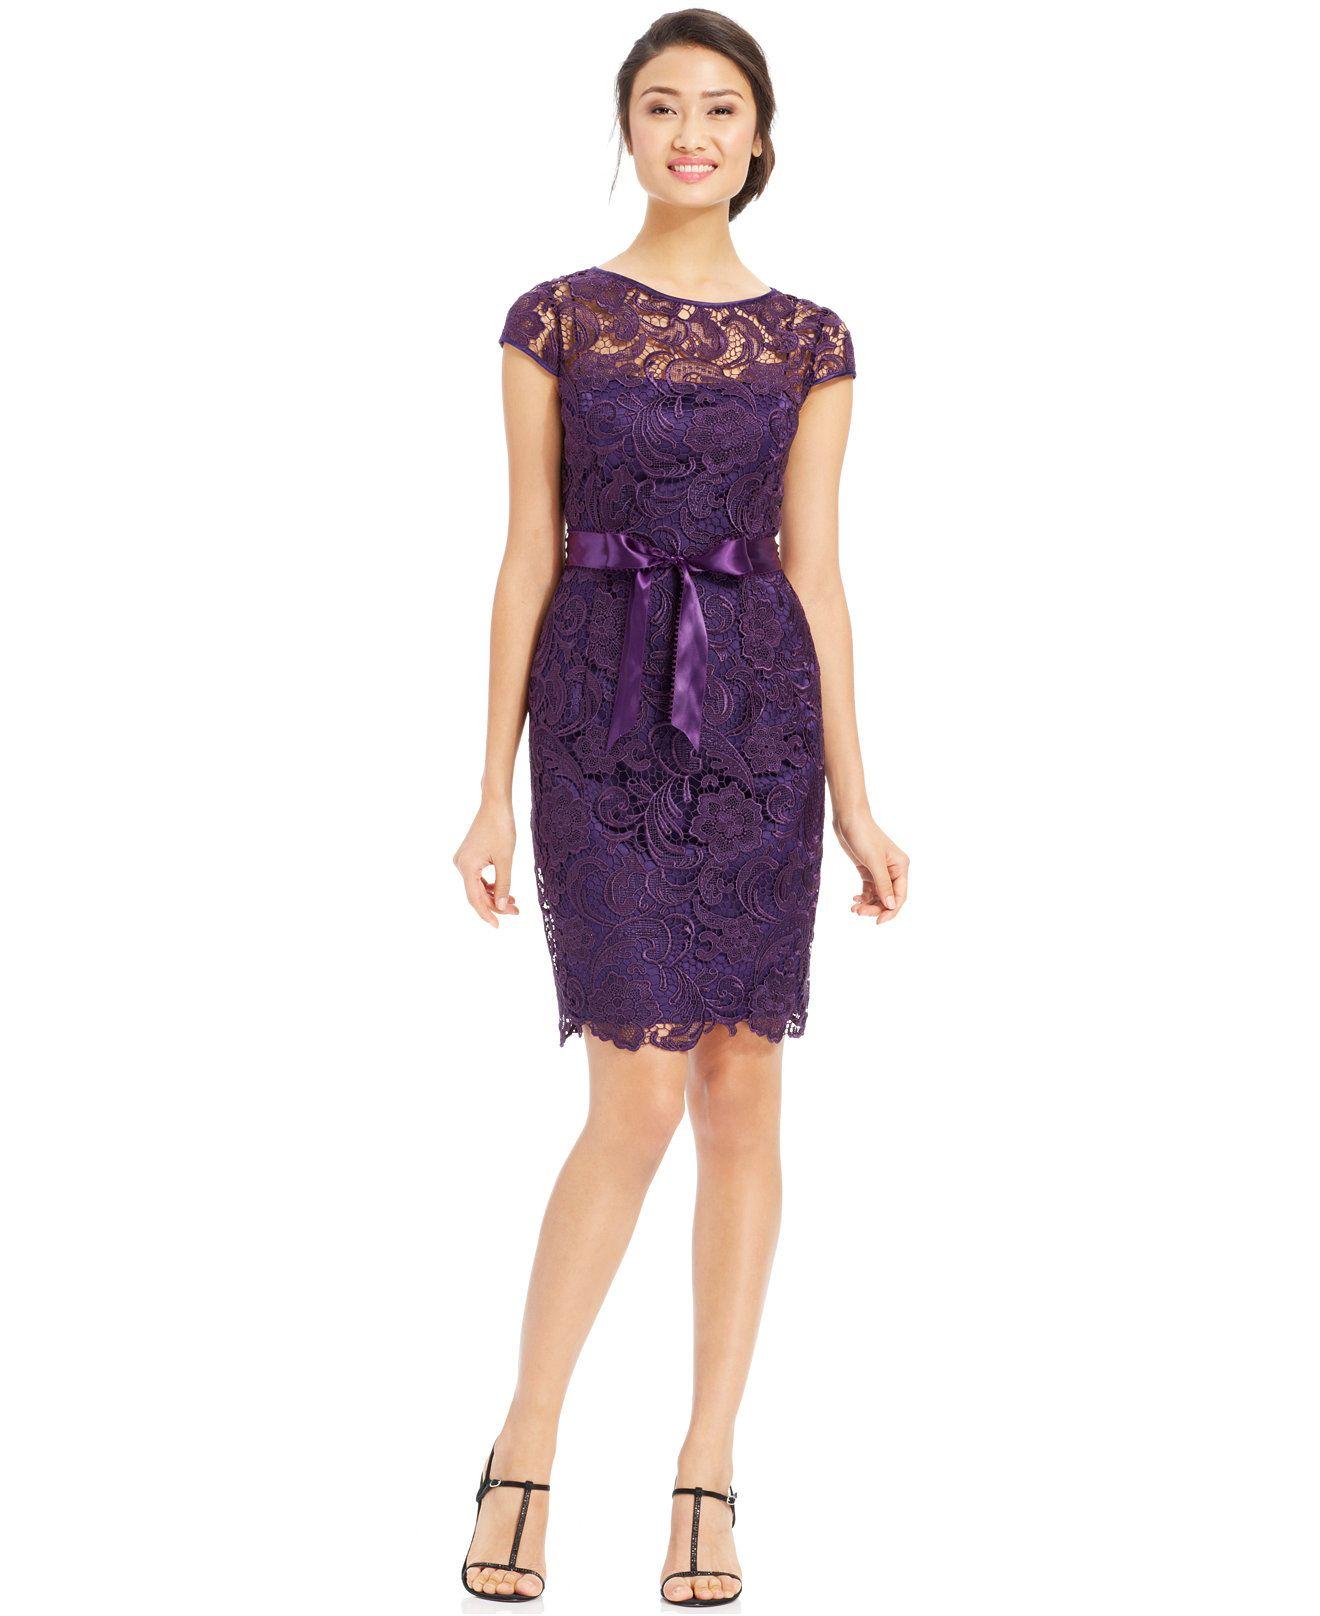 Adrianna Papell Lace Cap-Sleeve Illusion Sheath Dress | Adrianna ...